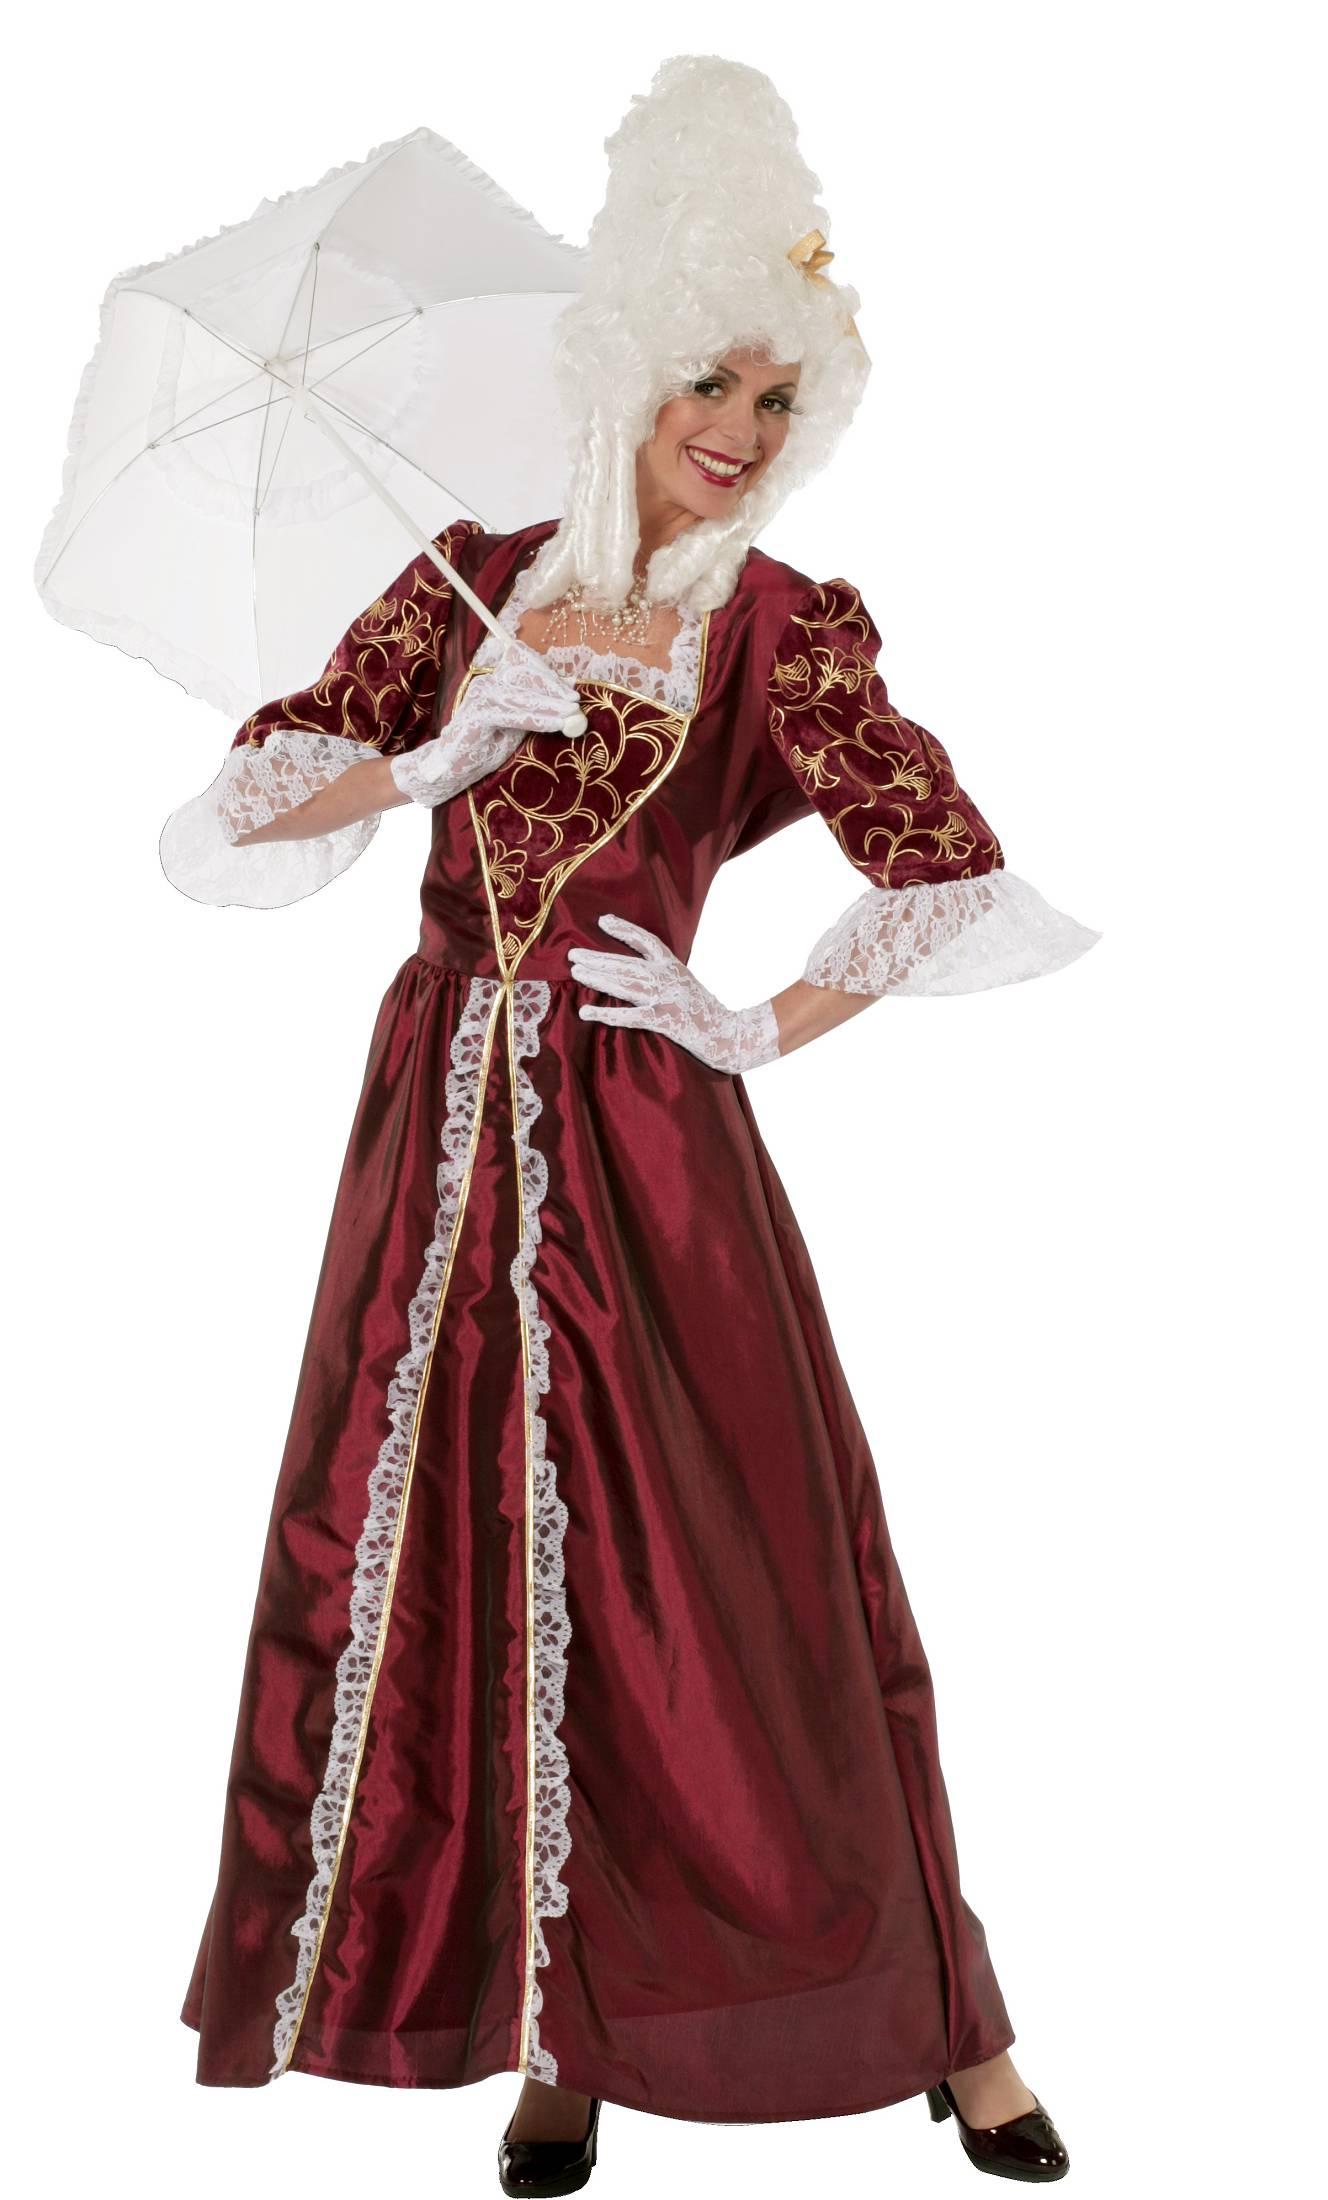 Costume-Marquise-Bordeaux